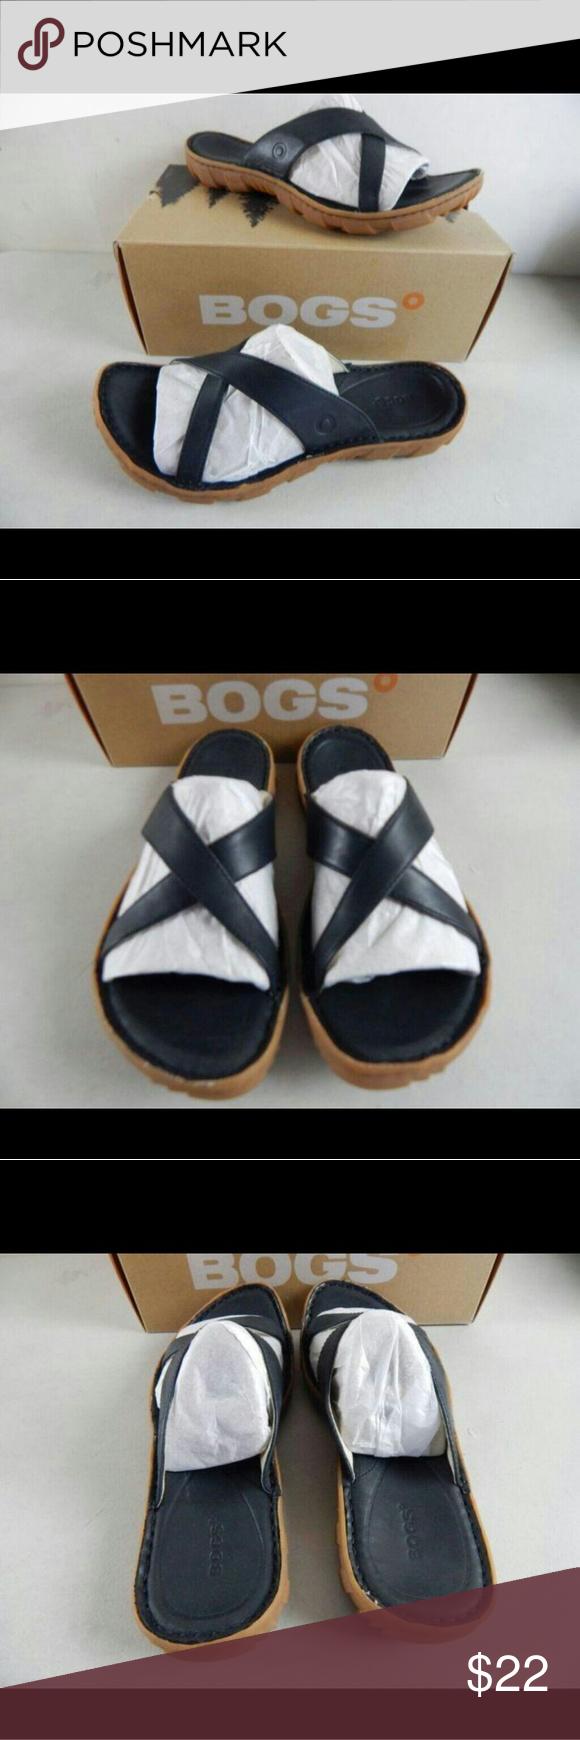 Bogs Women's Todo Slide Please see photos Bogs Shoes Sandals